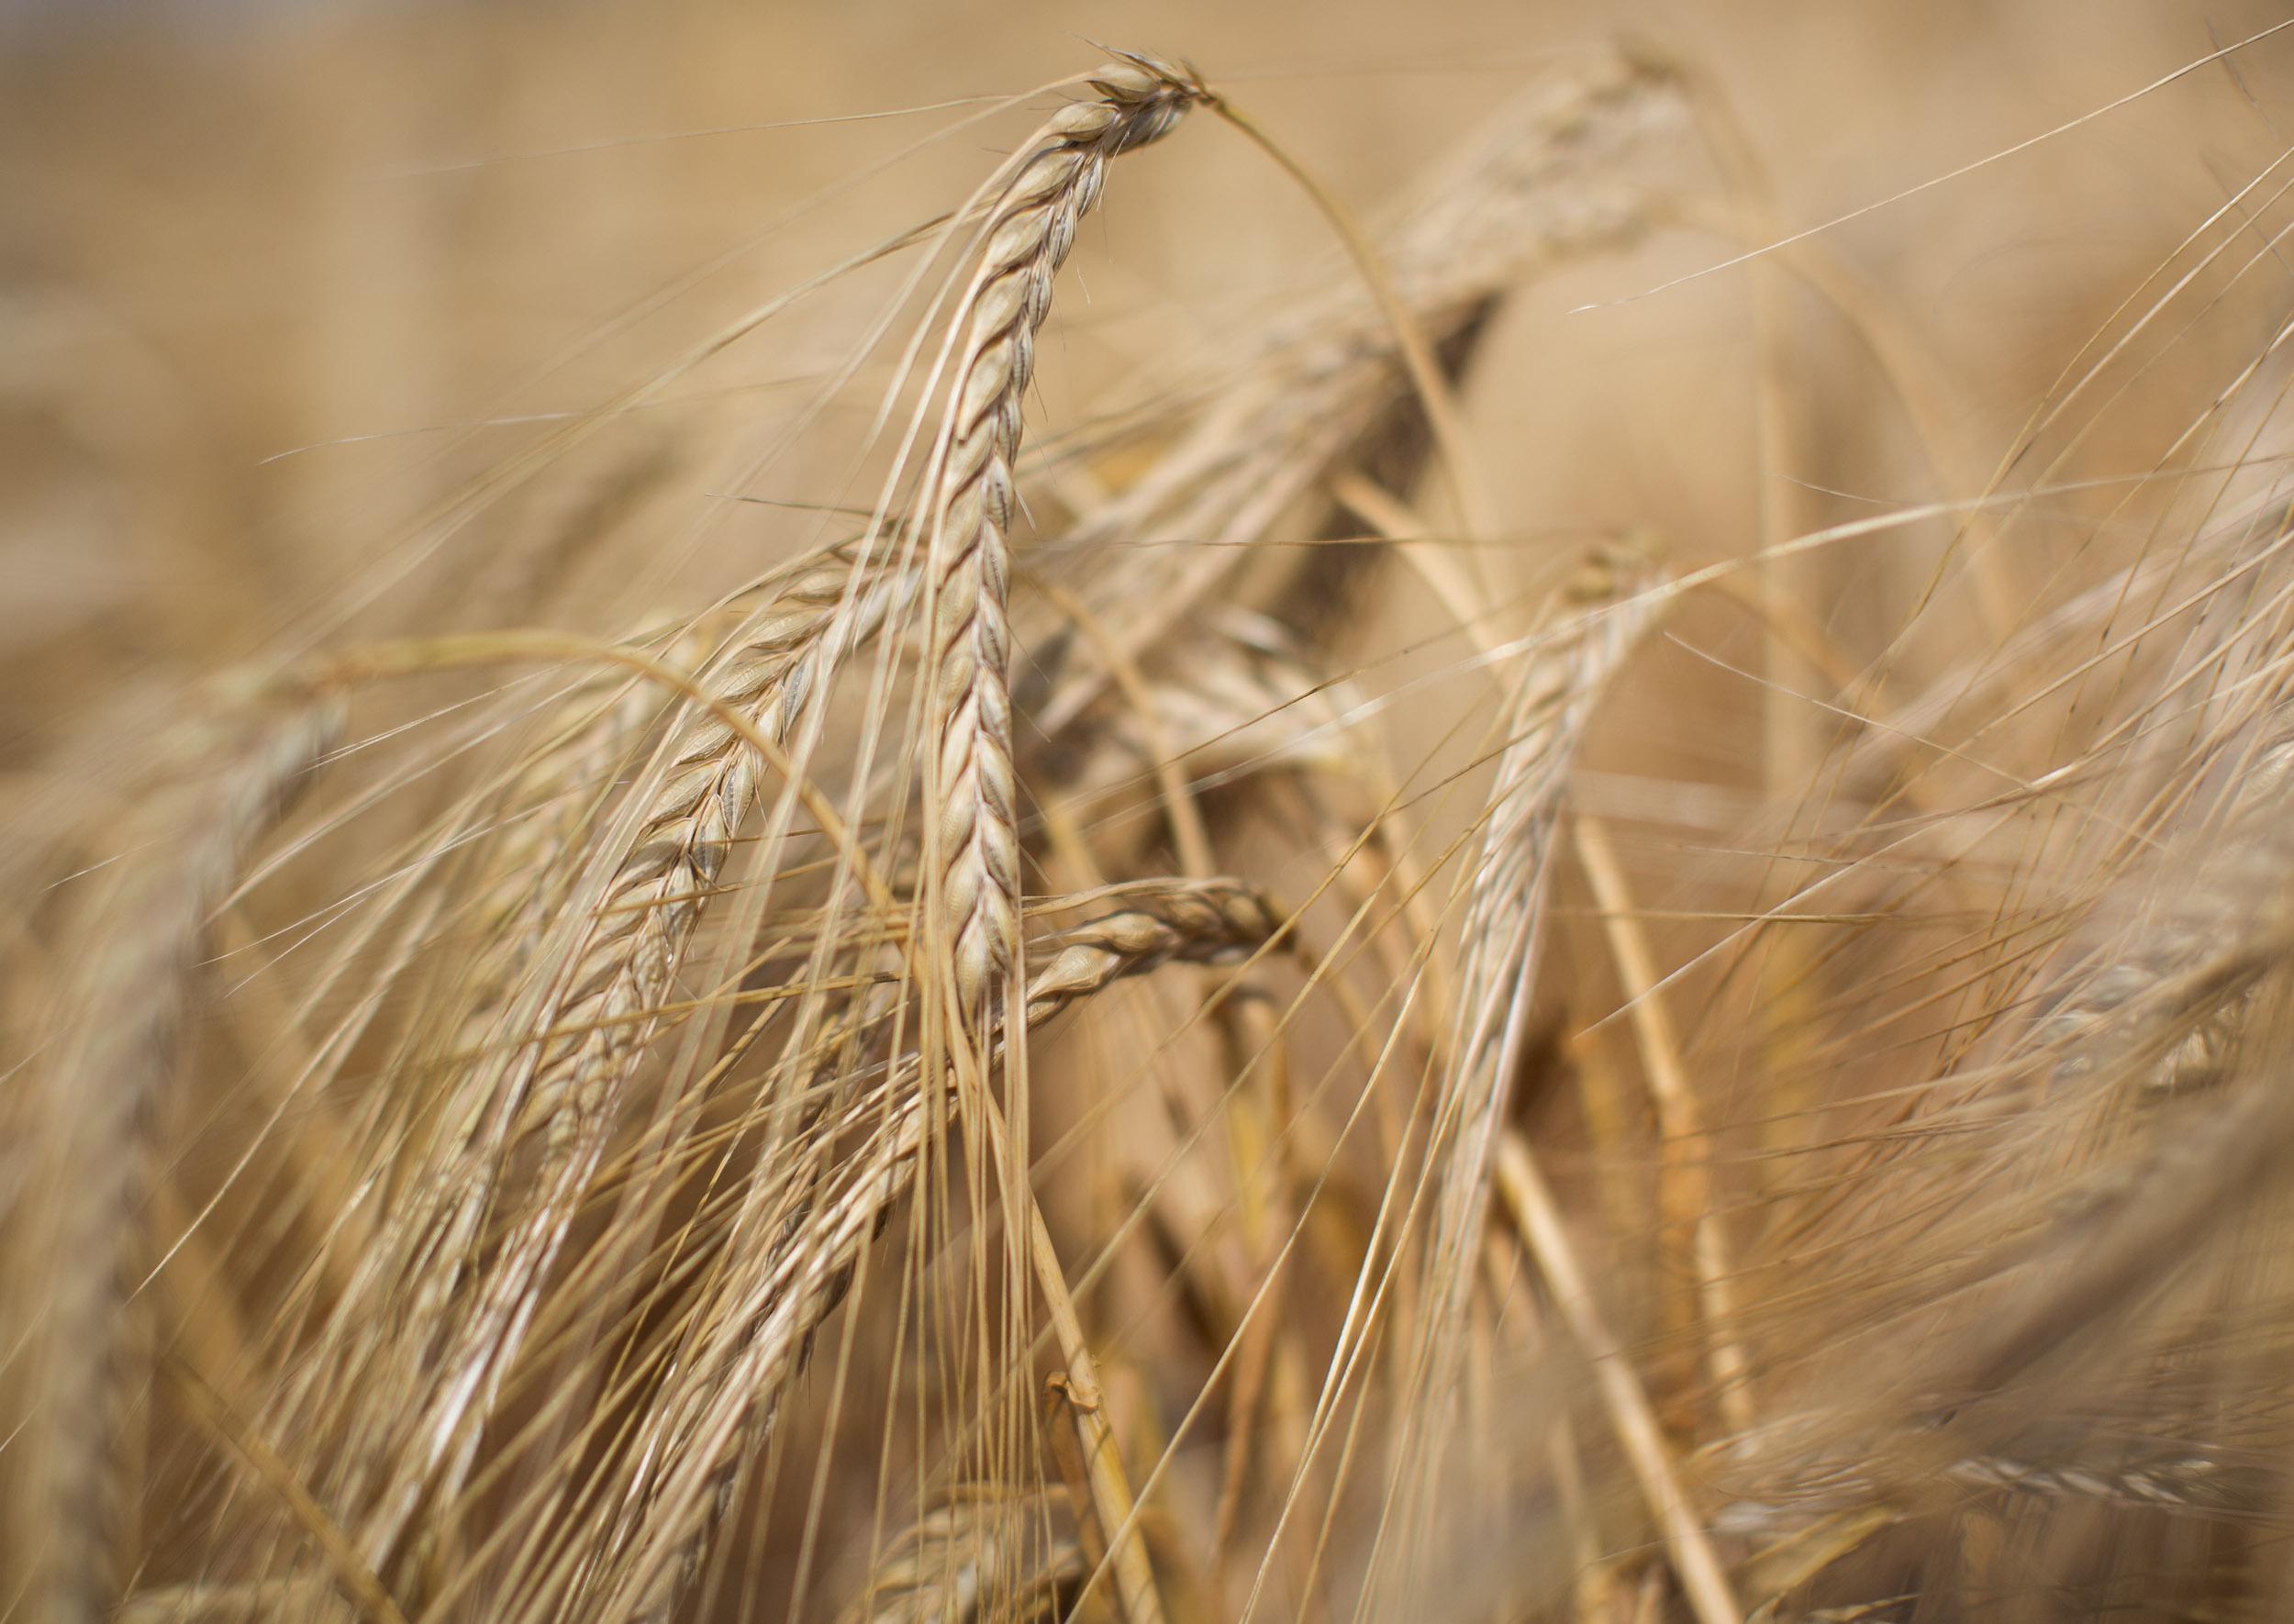 Landscape1_Wheat_Bolger_Photography.jpg